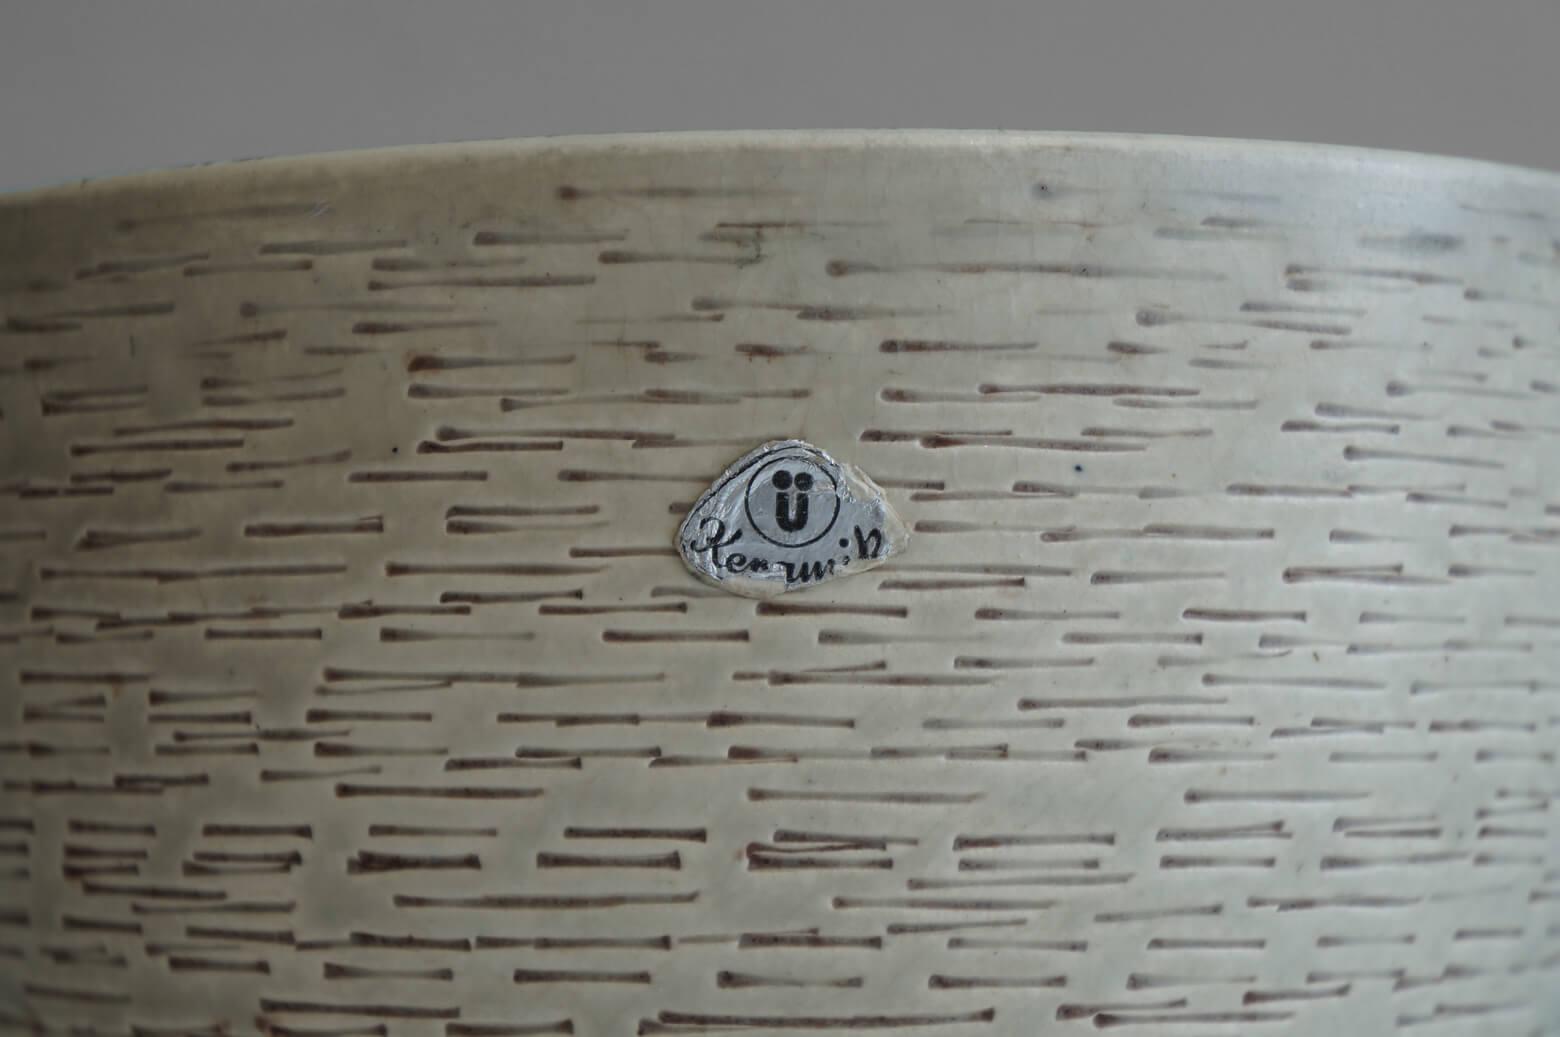 West Germany Ü Keramik Vintage Flower Pot/西ドイツ Ü ケラミック ヴィンテージ 植木鉢カバー ポット